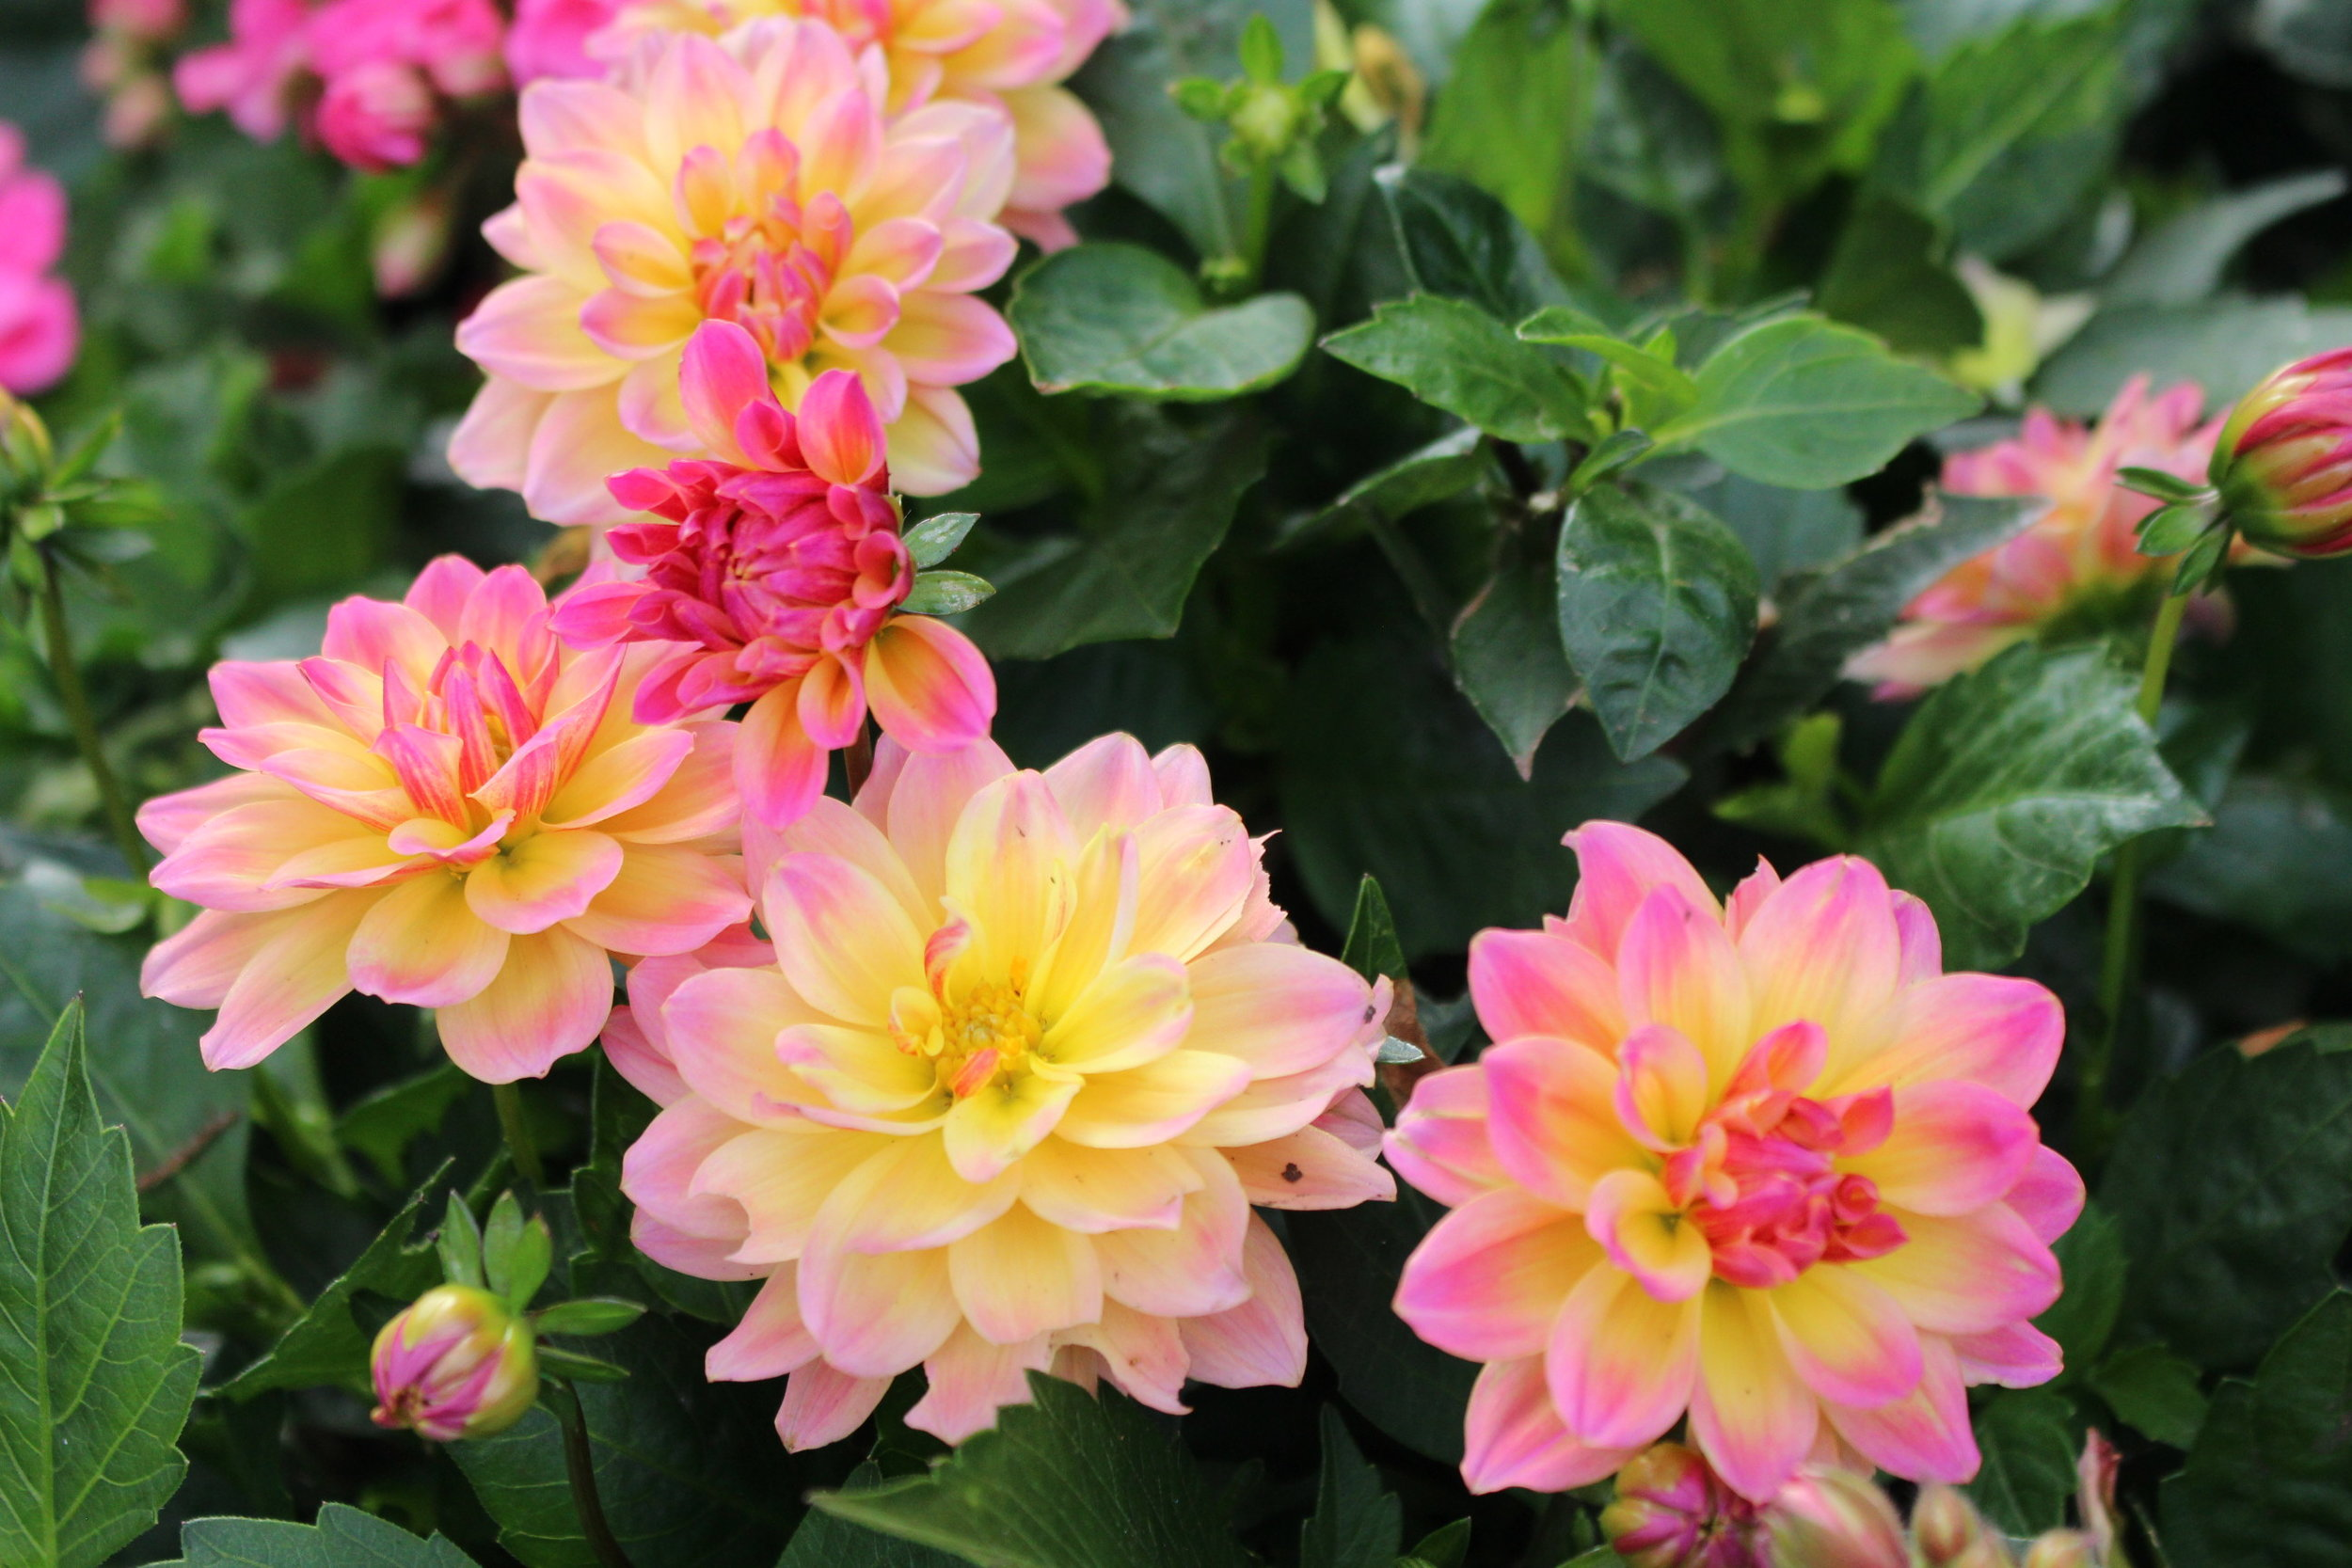 #165 Dahlia, Asteraceae